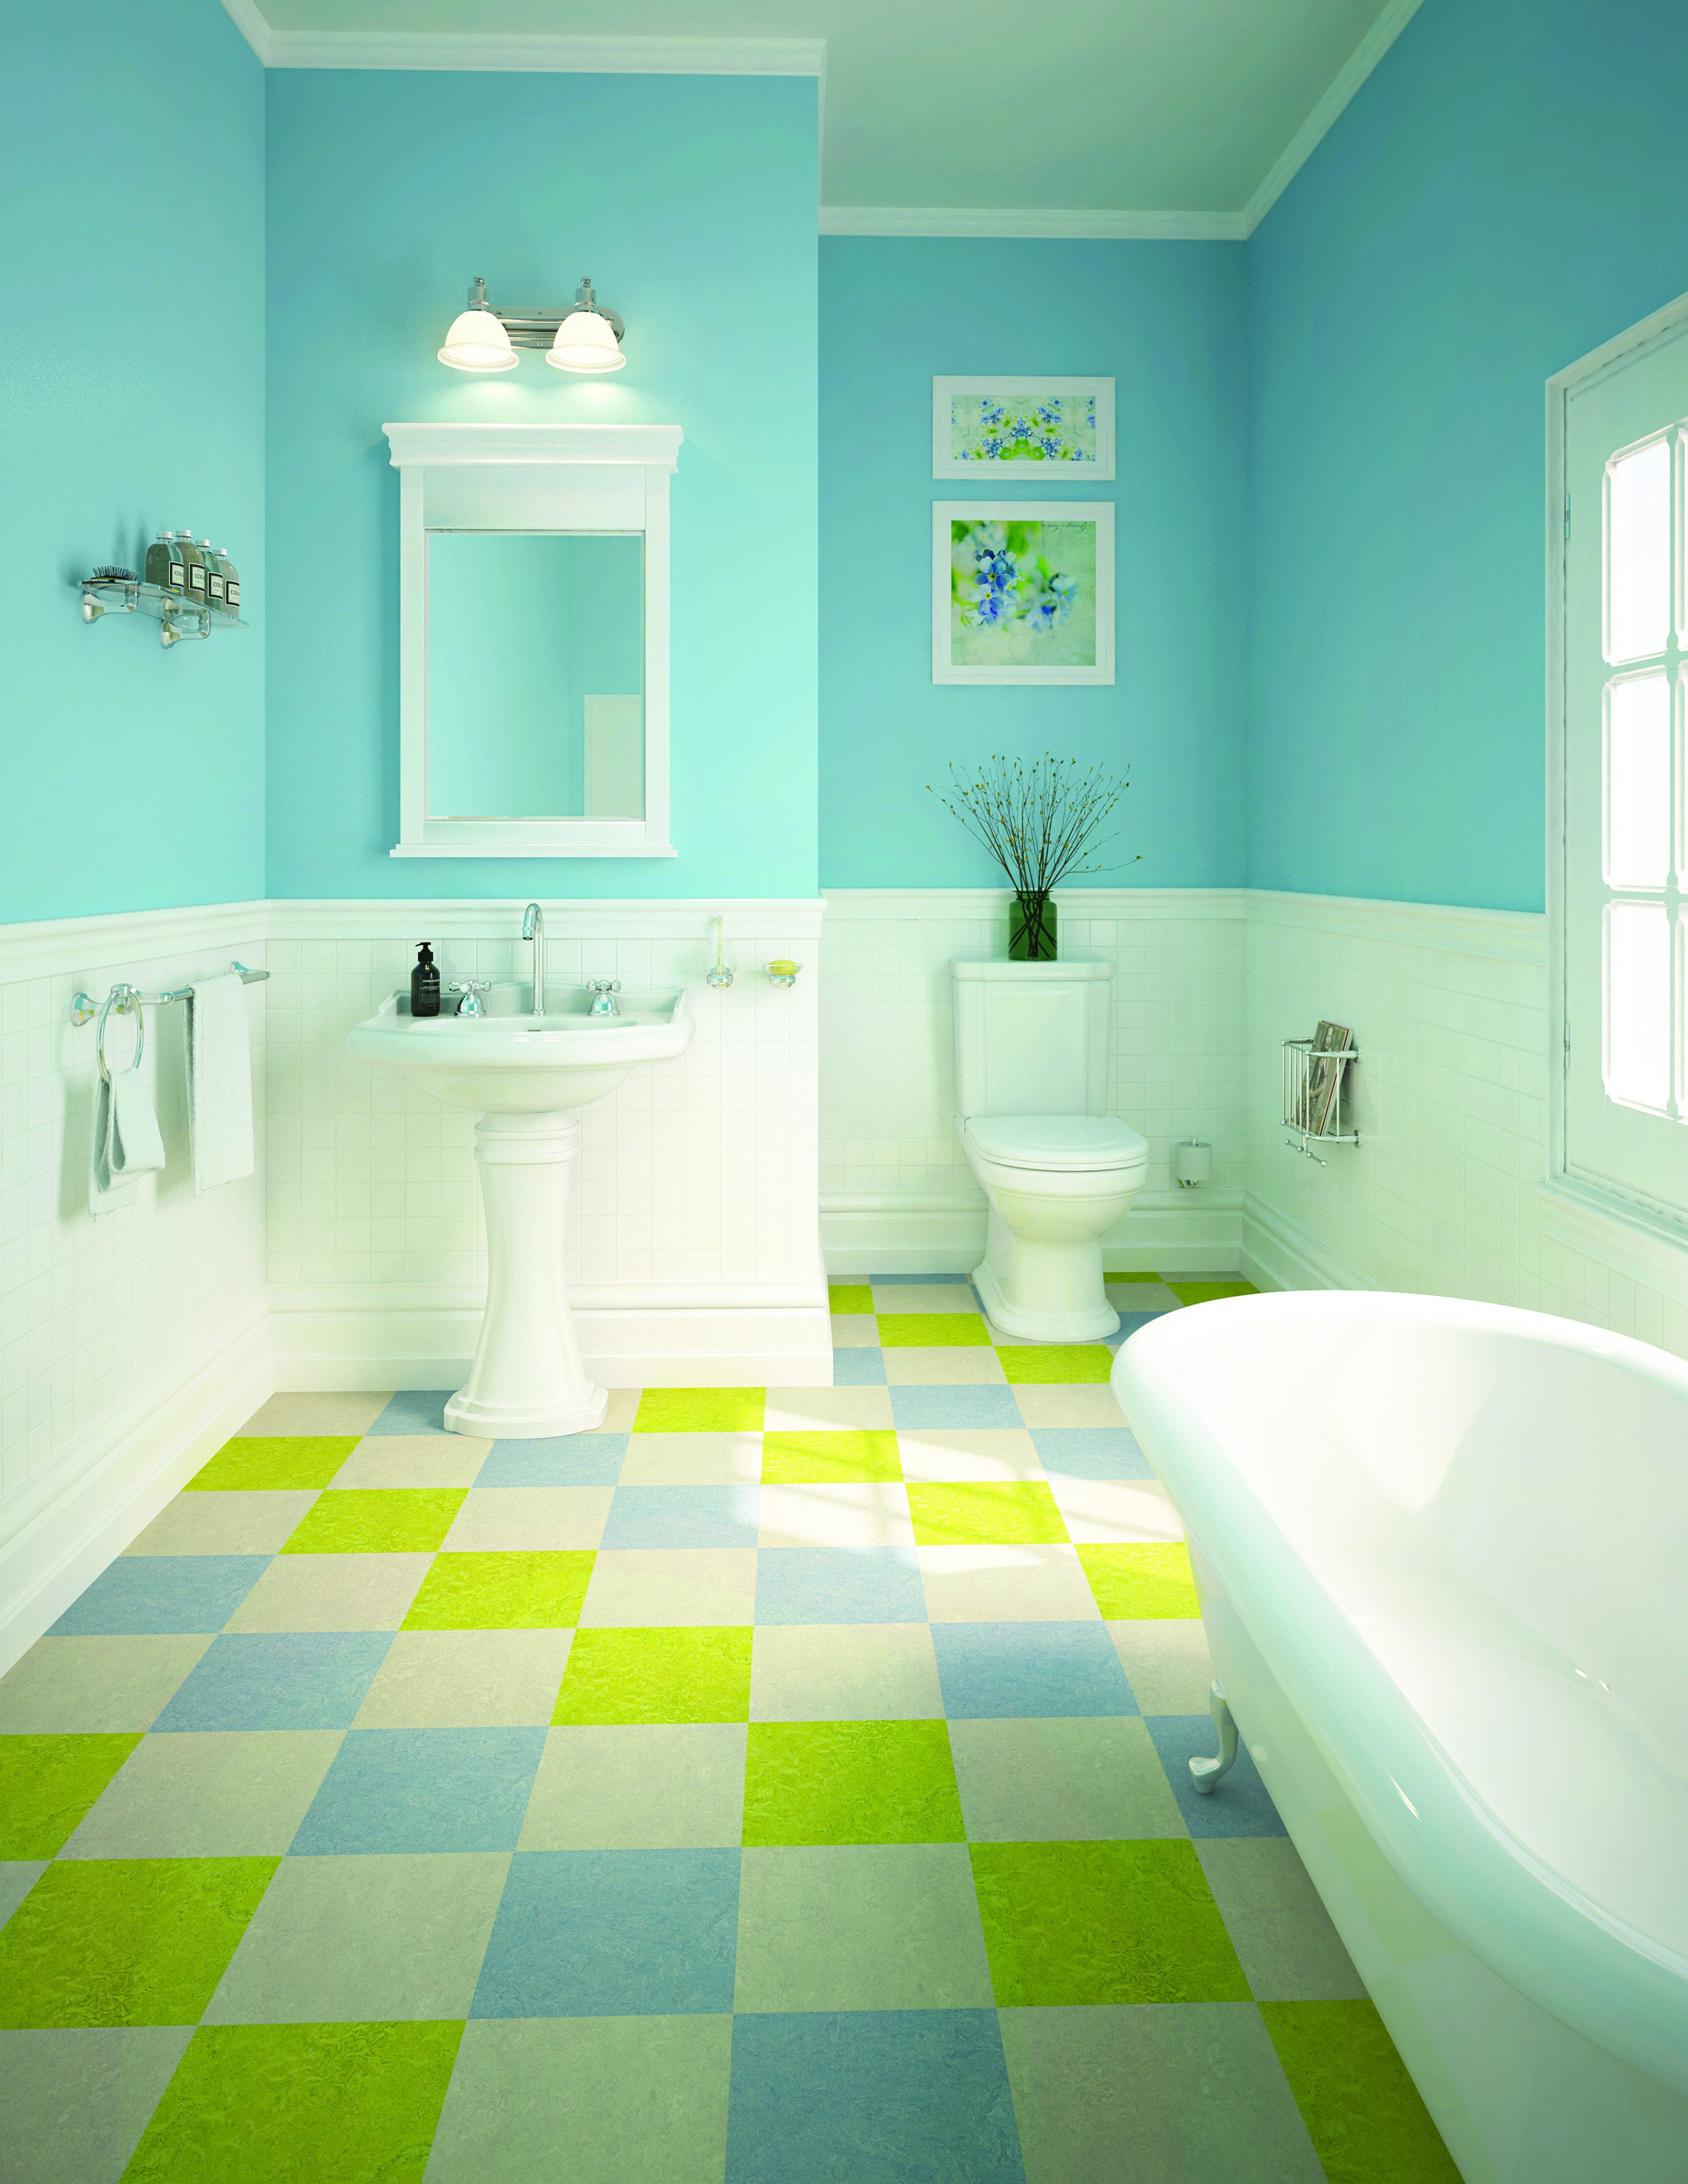 ClickCinchLoc_Bathroom_CMYK.jpg